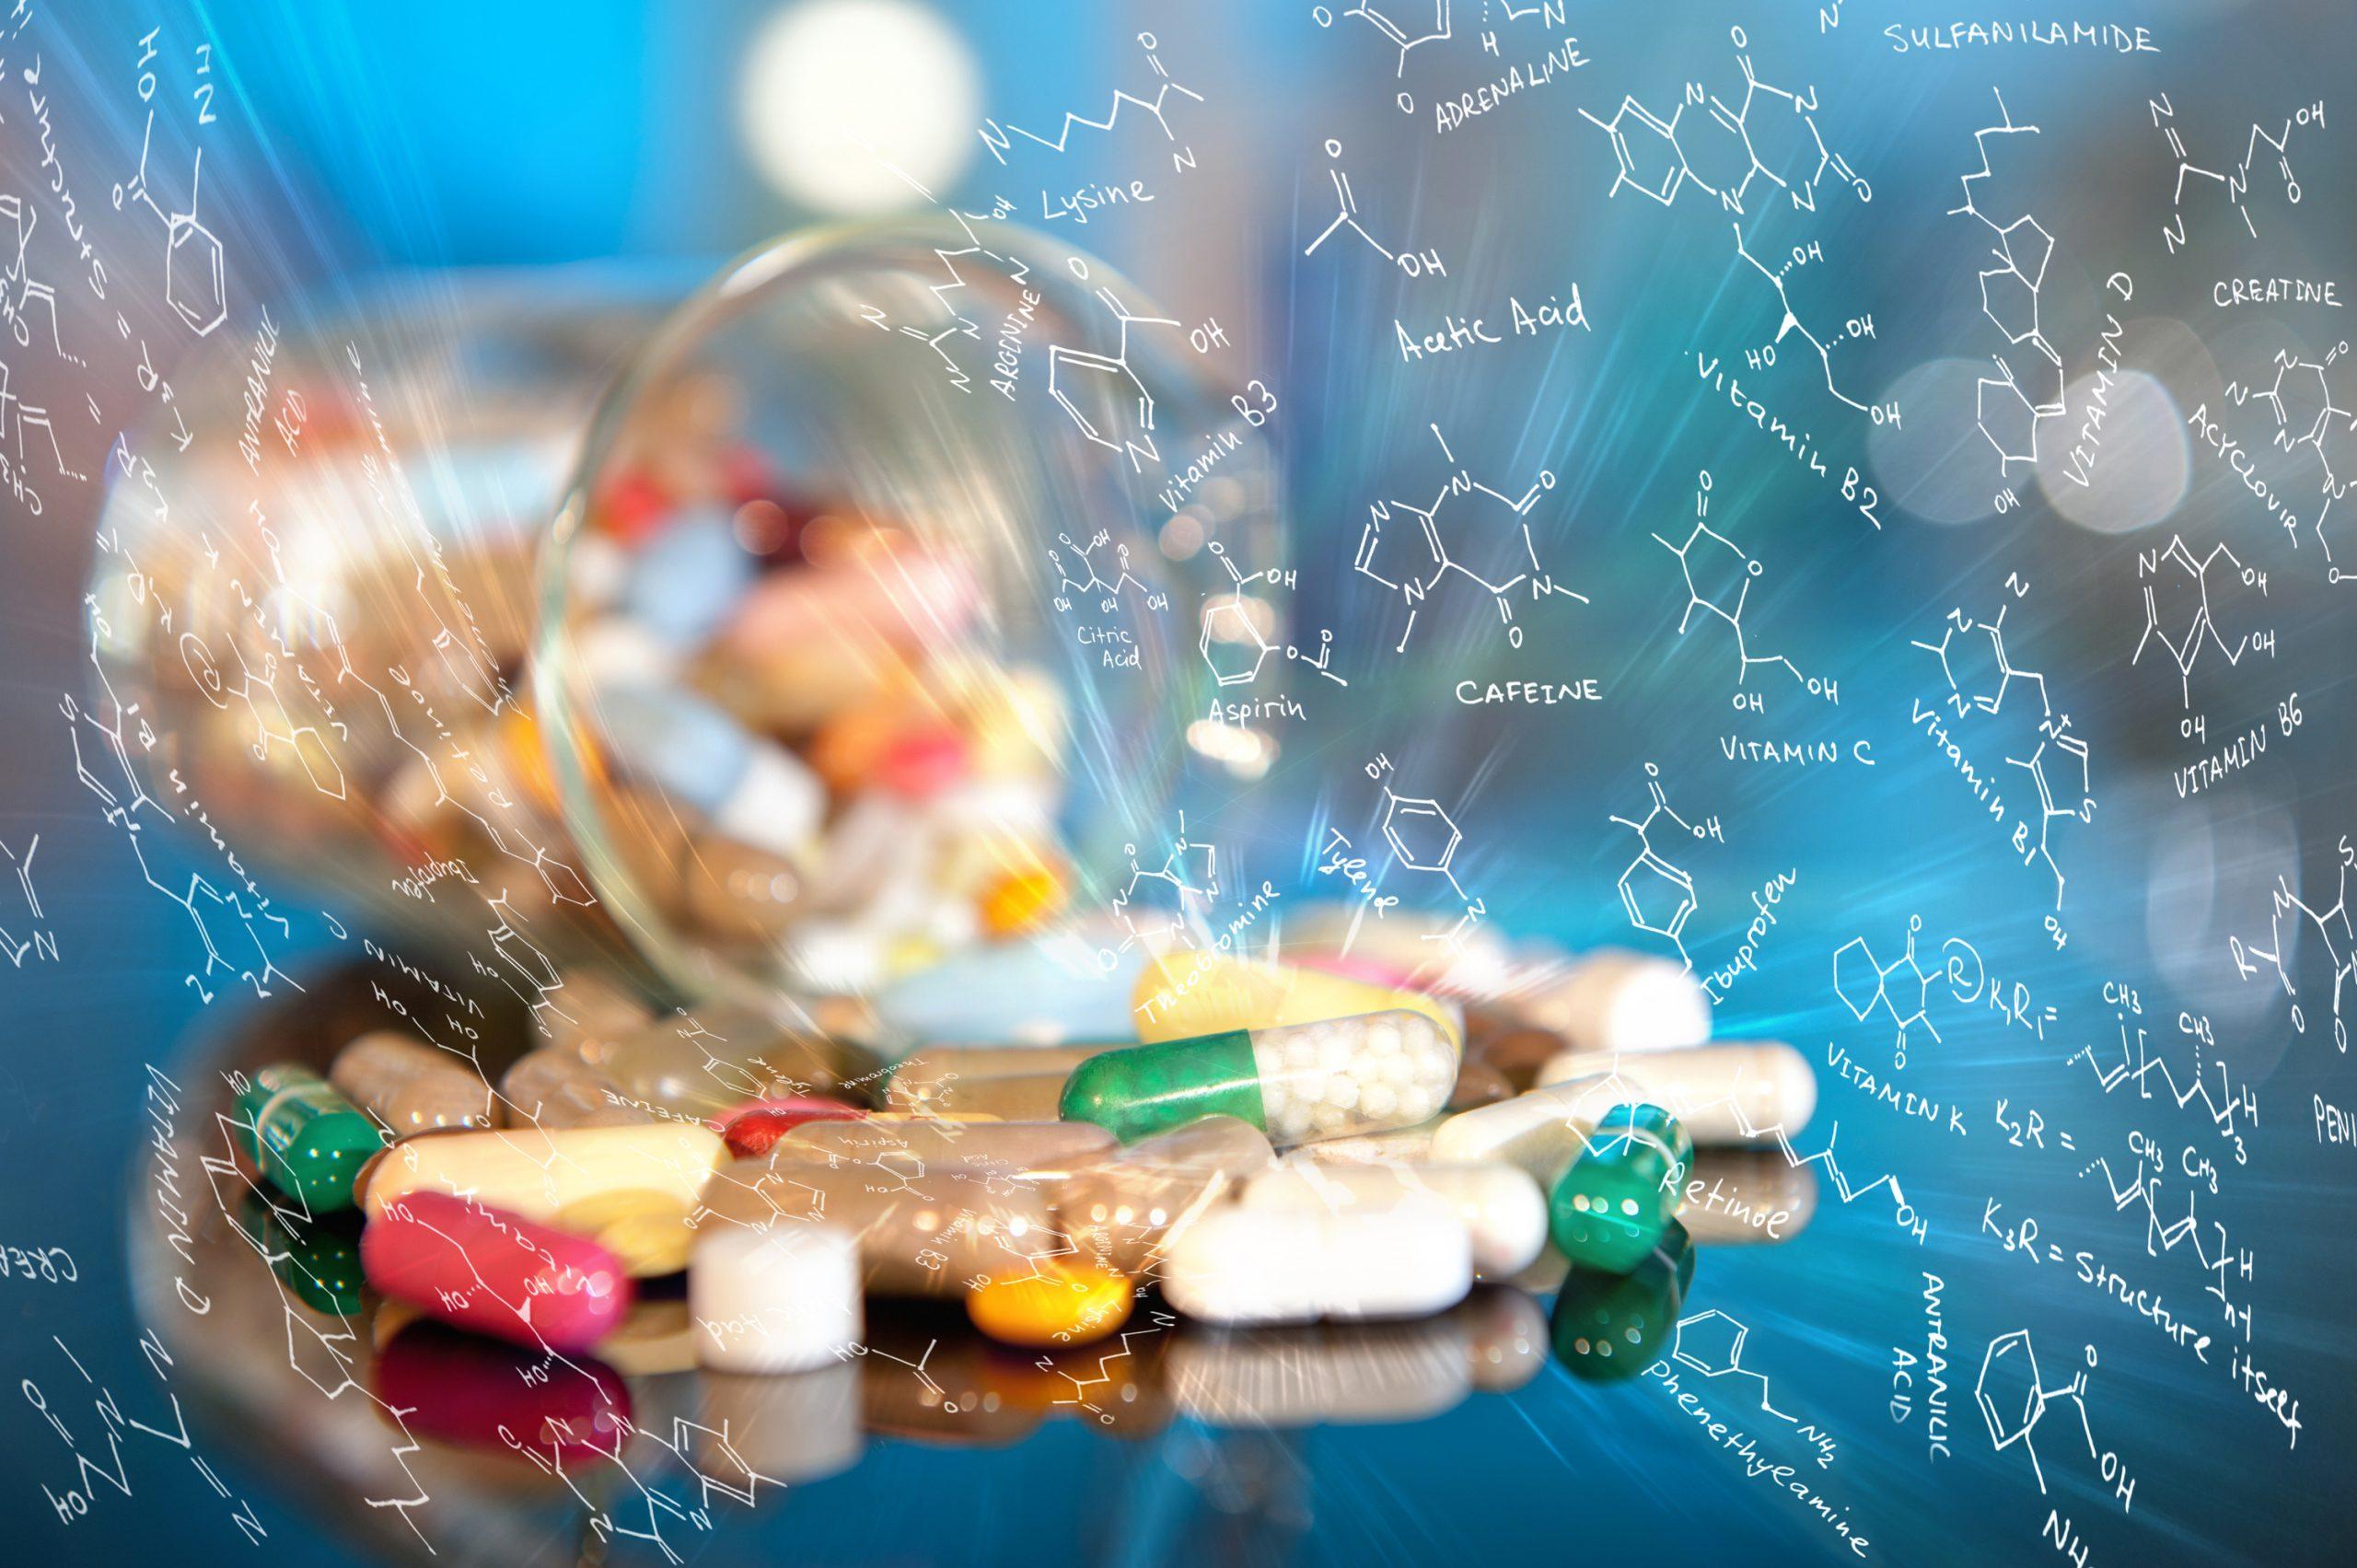 dr pop md medicine diabetes 69